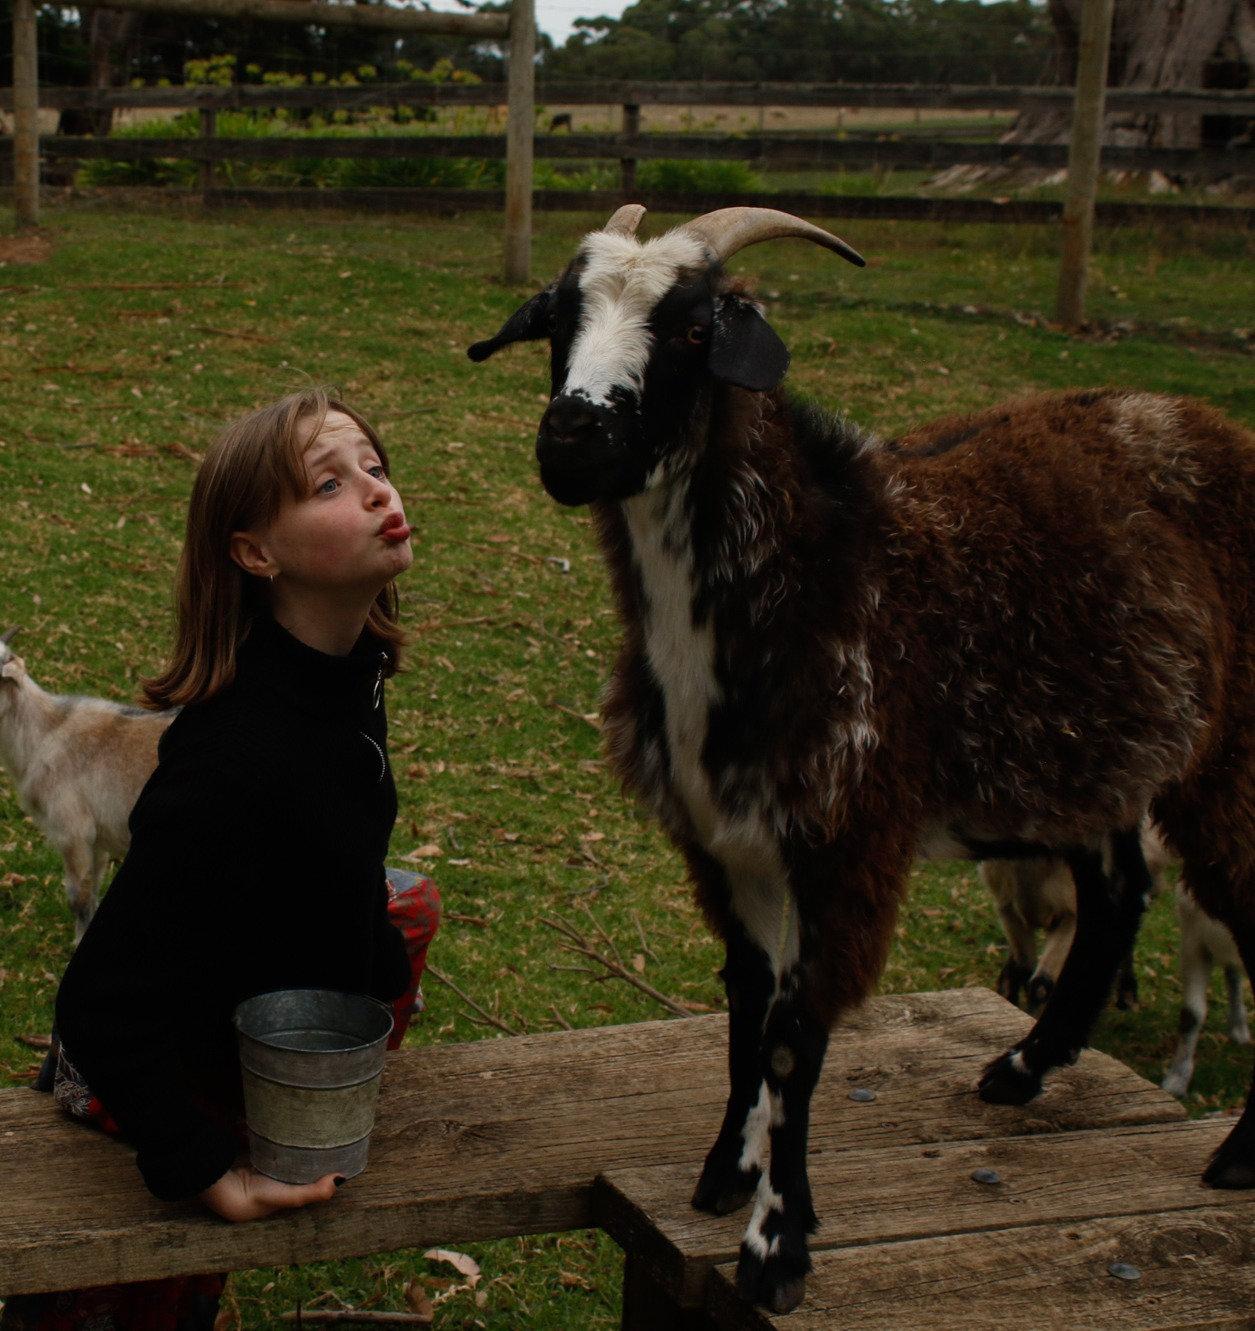 Behind the Scenes Farm Tour - CHILD